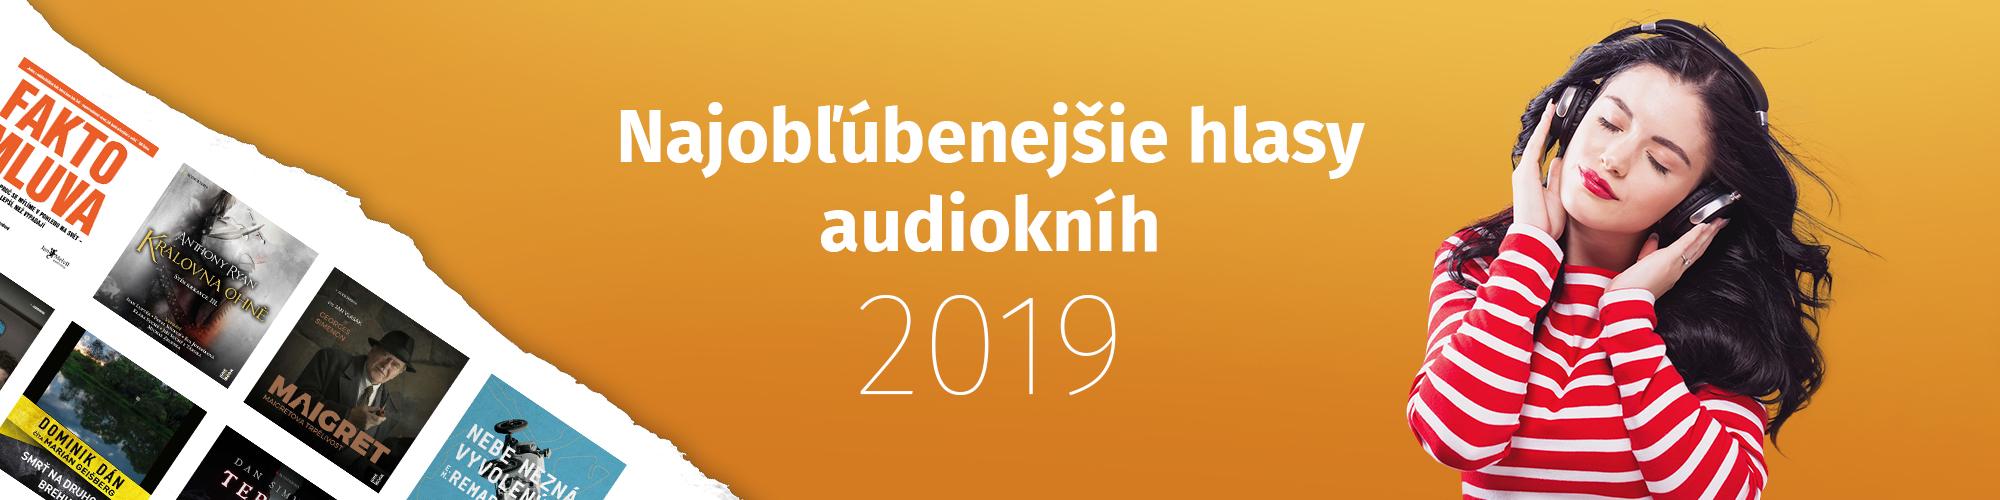 Nejobľúbenejší rozprávači audiokníh roku 2019